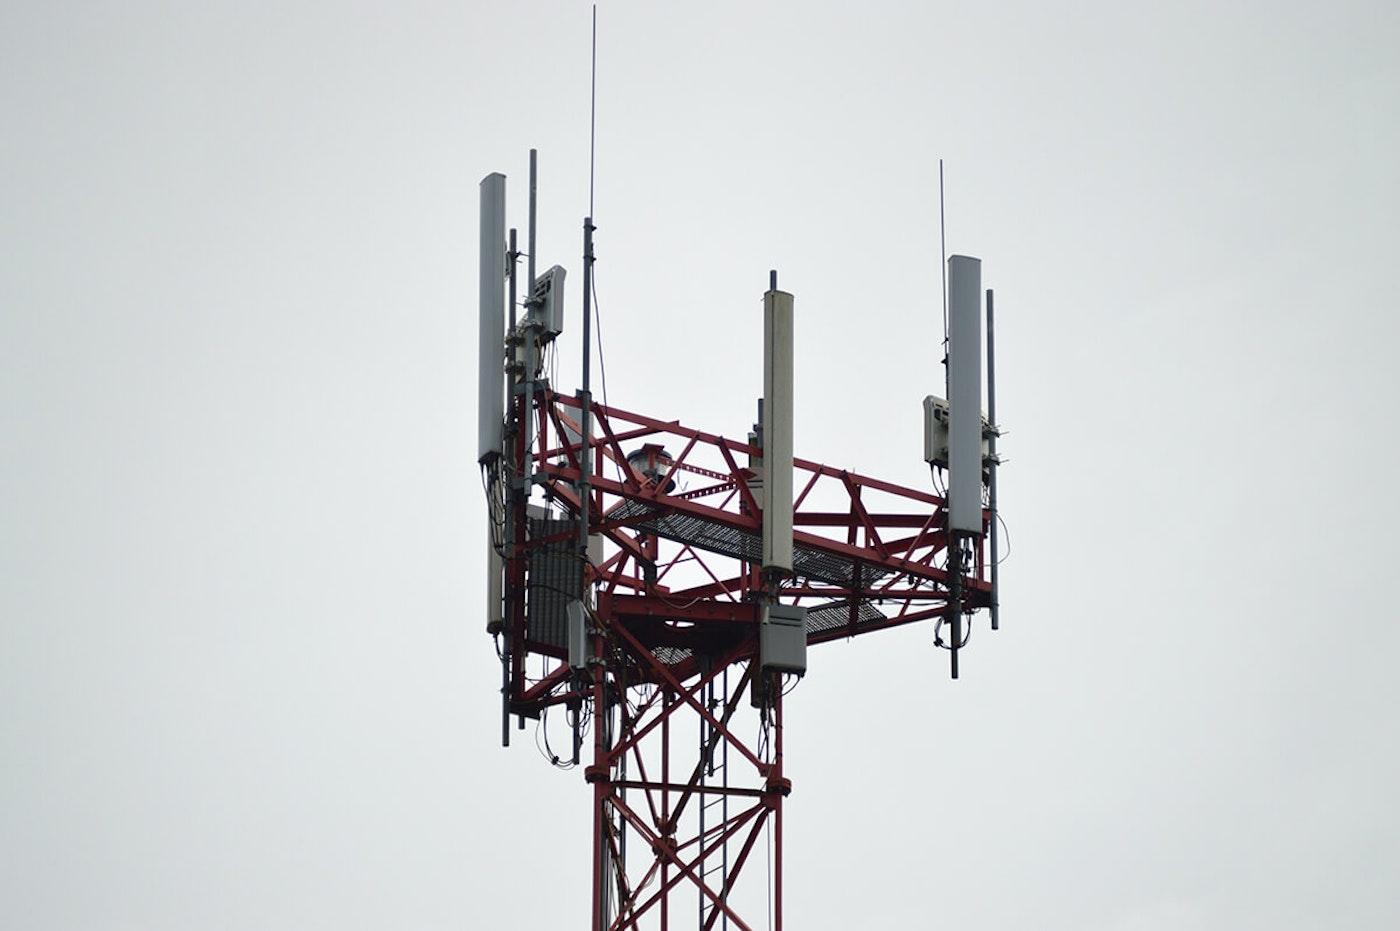 An internet tower. (Photo via Pexels/Miguel Á. Padriñán)